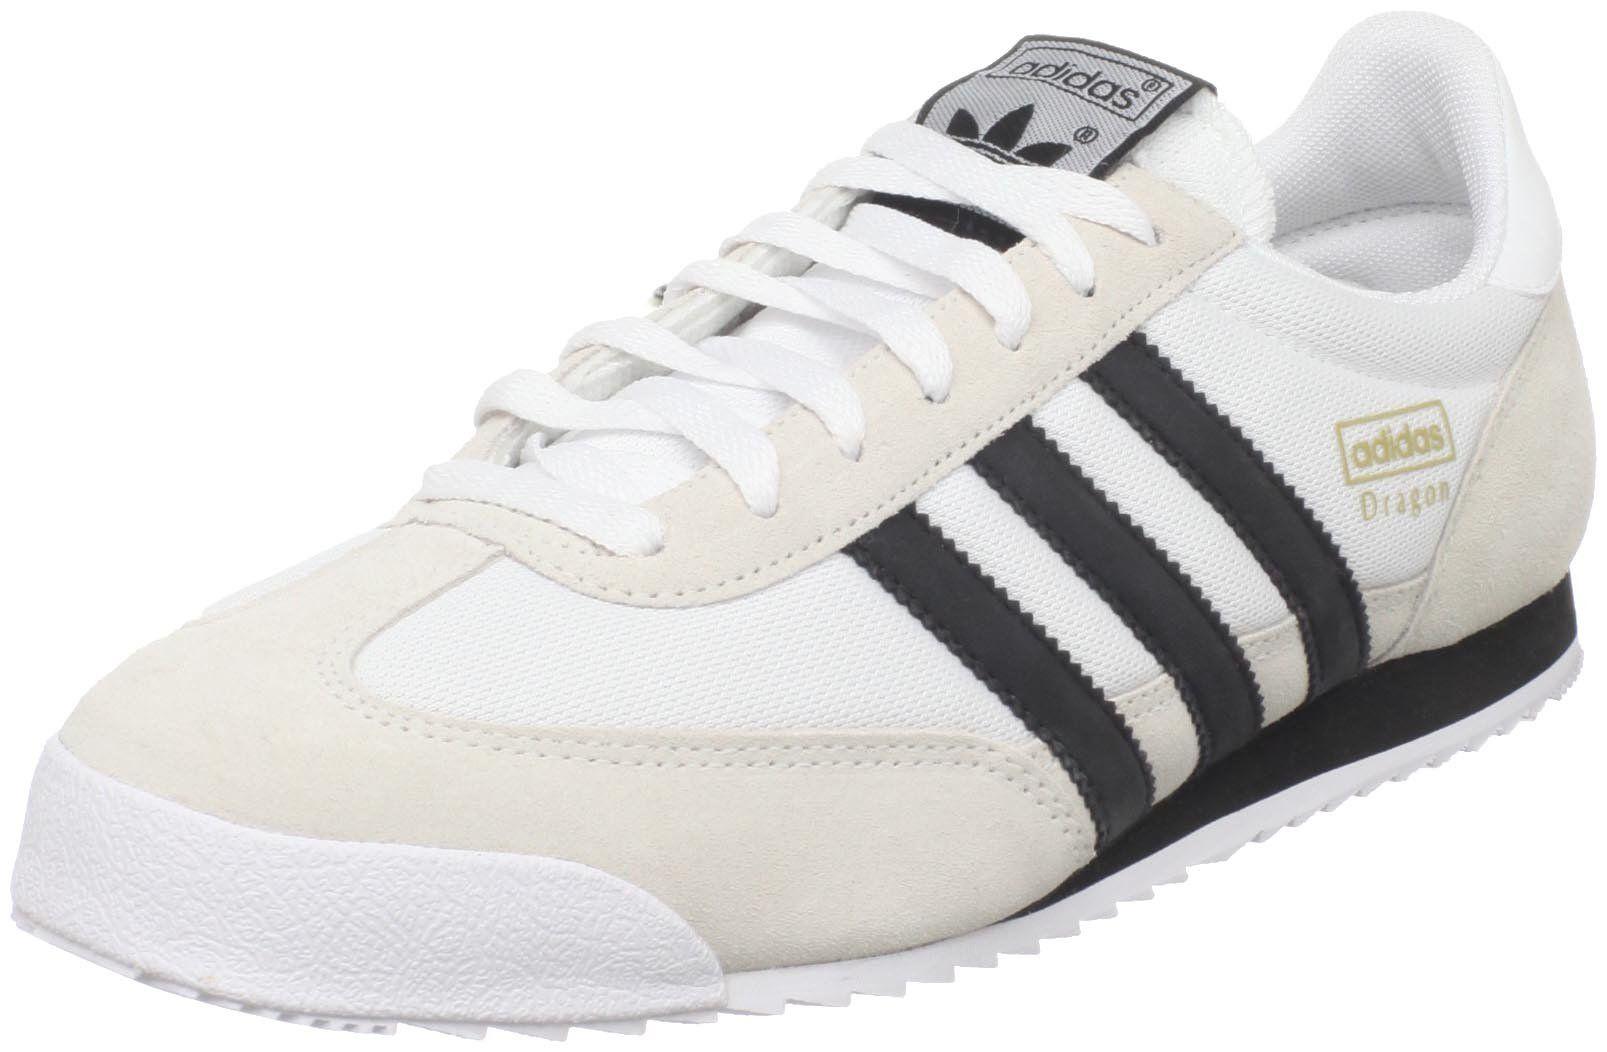 Amazon.com: adidas Originals Men's Dragon Fashion Sneaker: Adidas ...